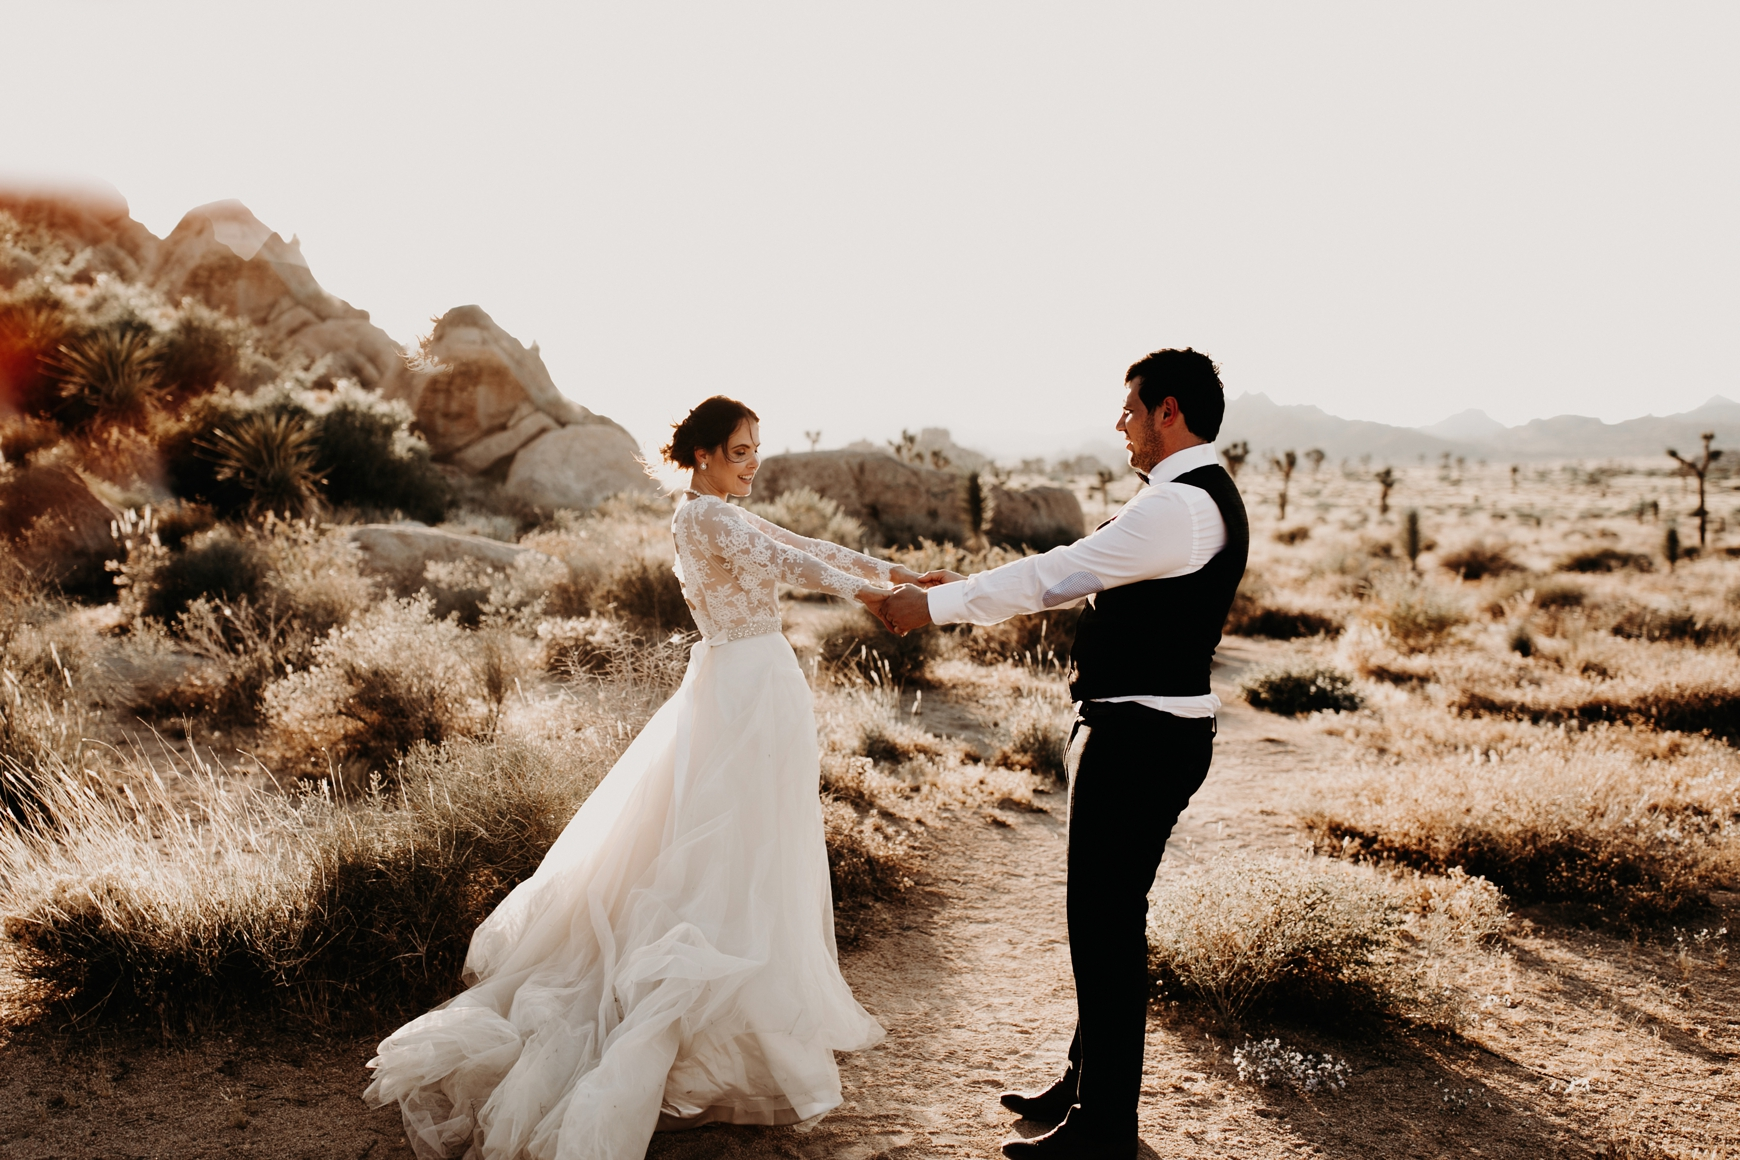 Joshua Tree Bridal Portraits Anastasia & Andrey Emily Magers Photography-166.jpg